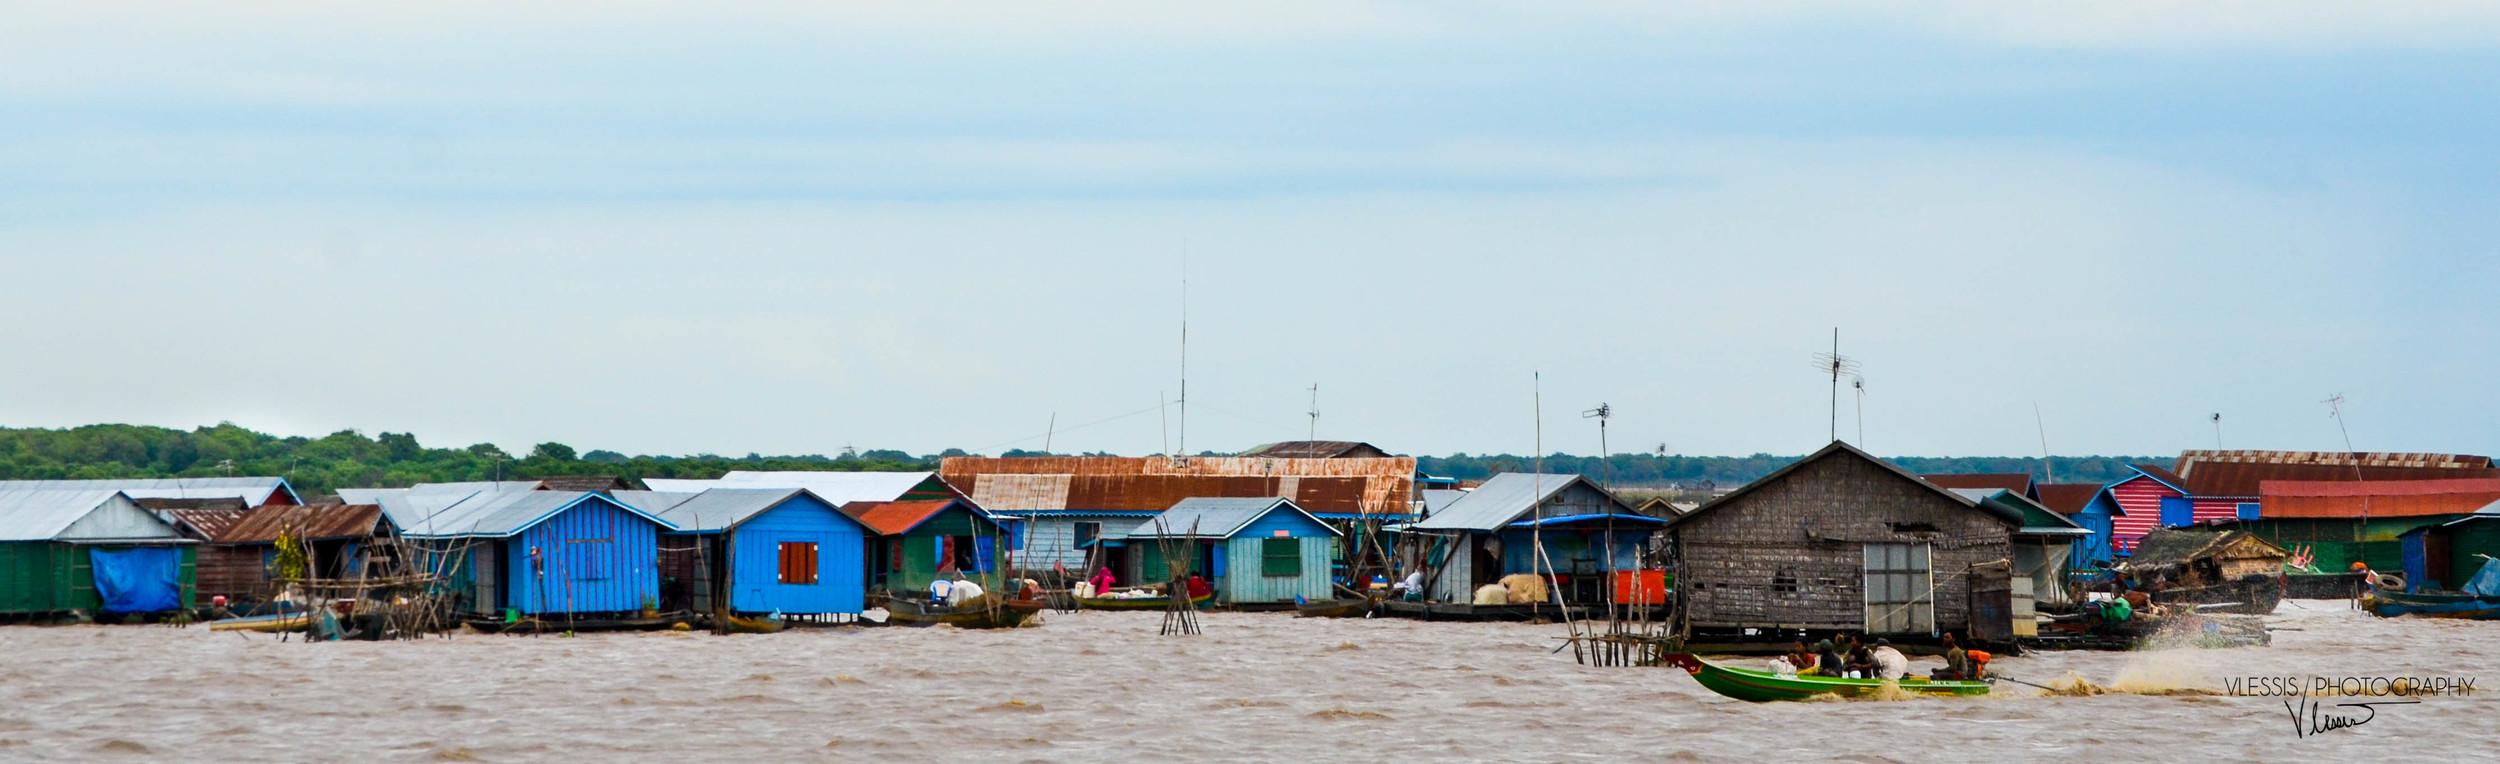 Cambodia (1 of 1)-10.jpg